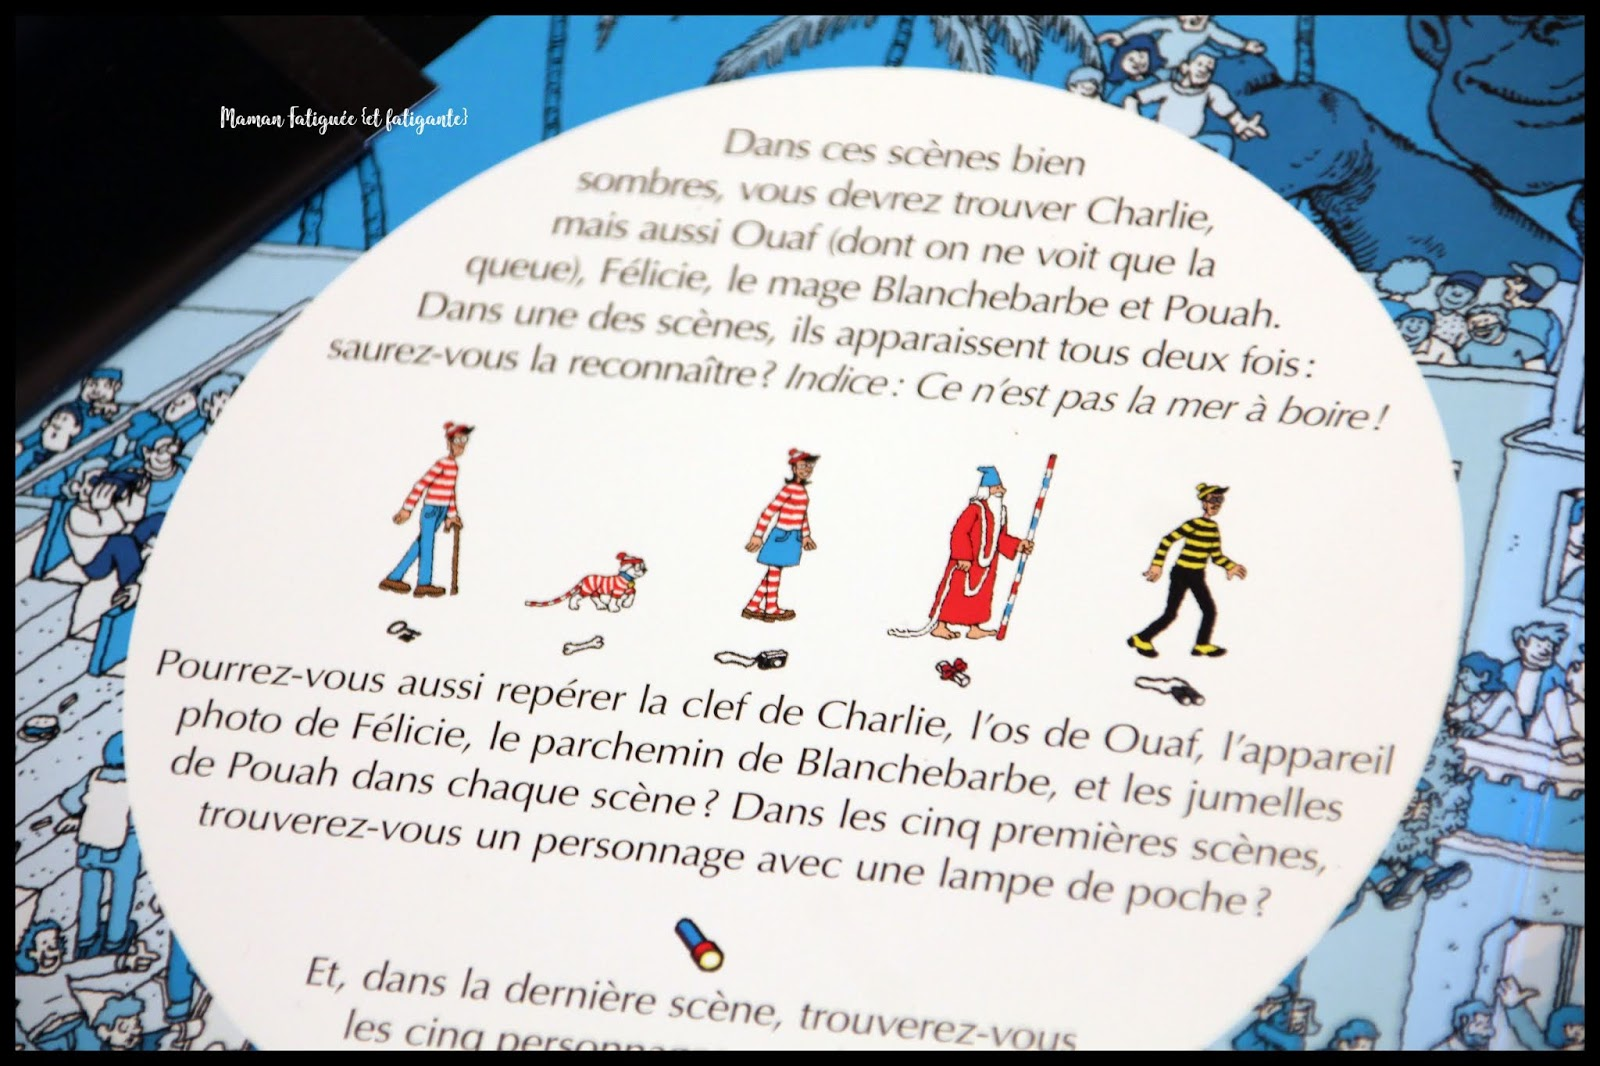 {et Fatigante} Fatiguée Maman 5ra34lj Est Diabolique Où Charliel'enquête 80nOkwP